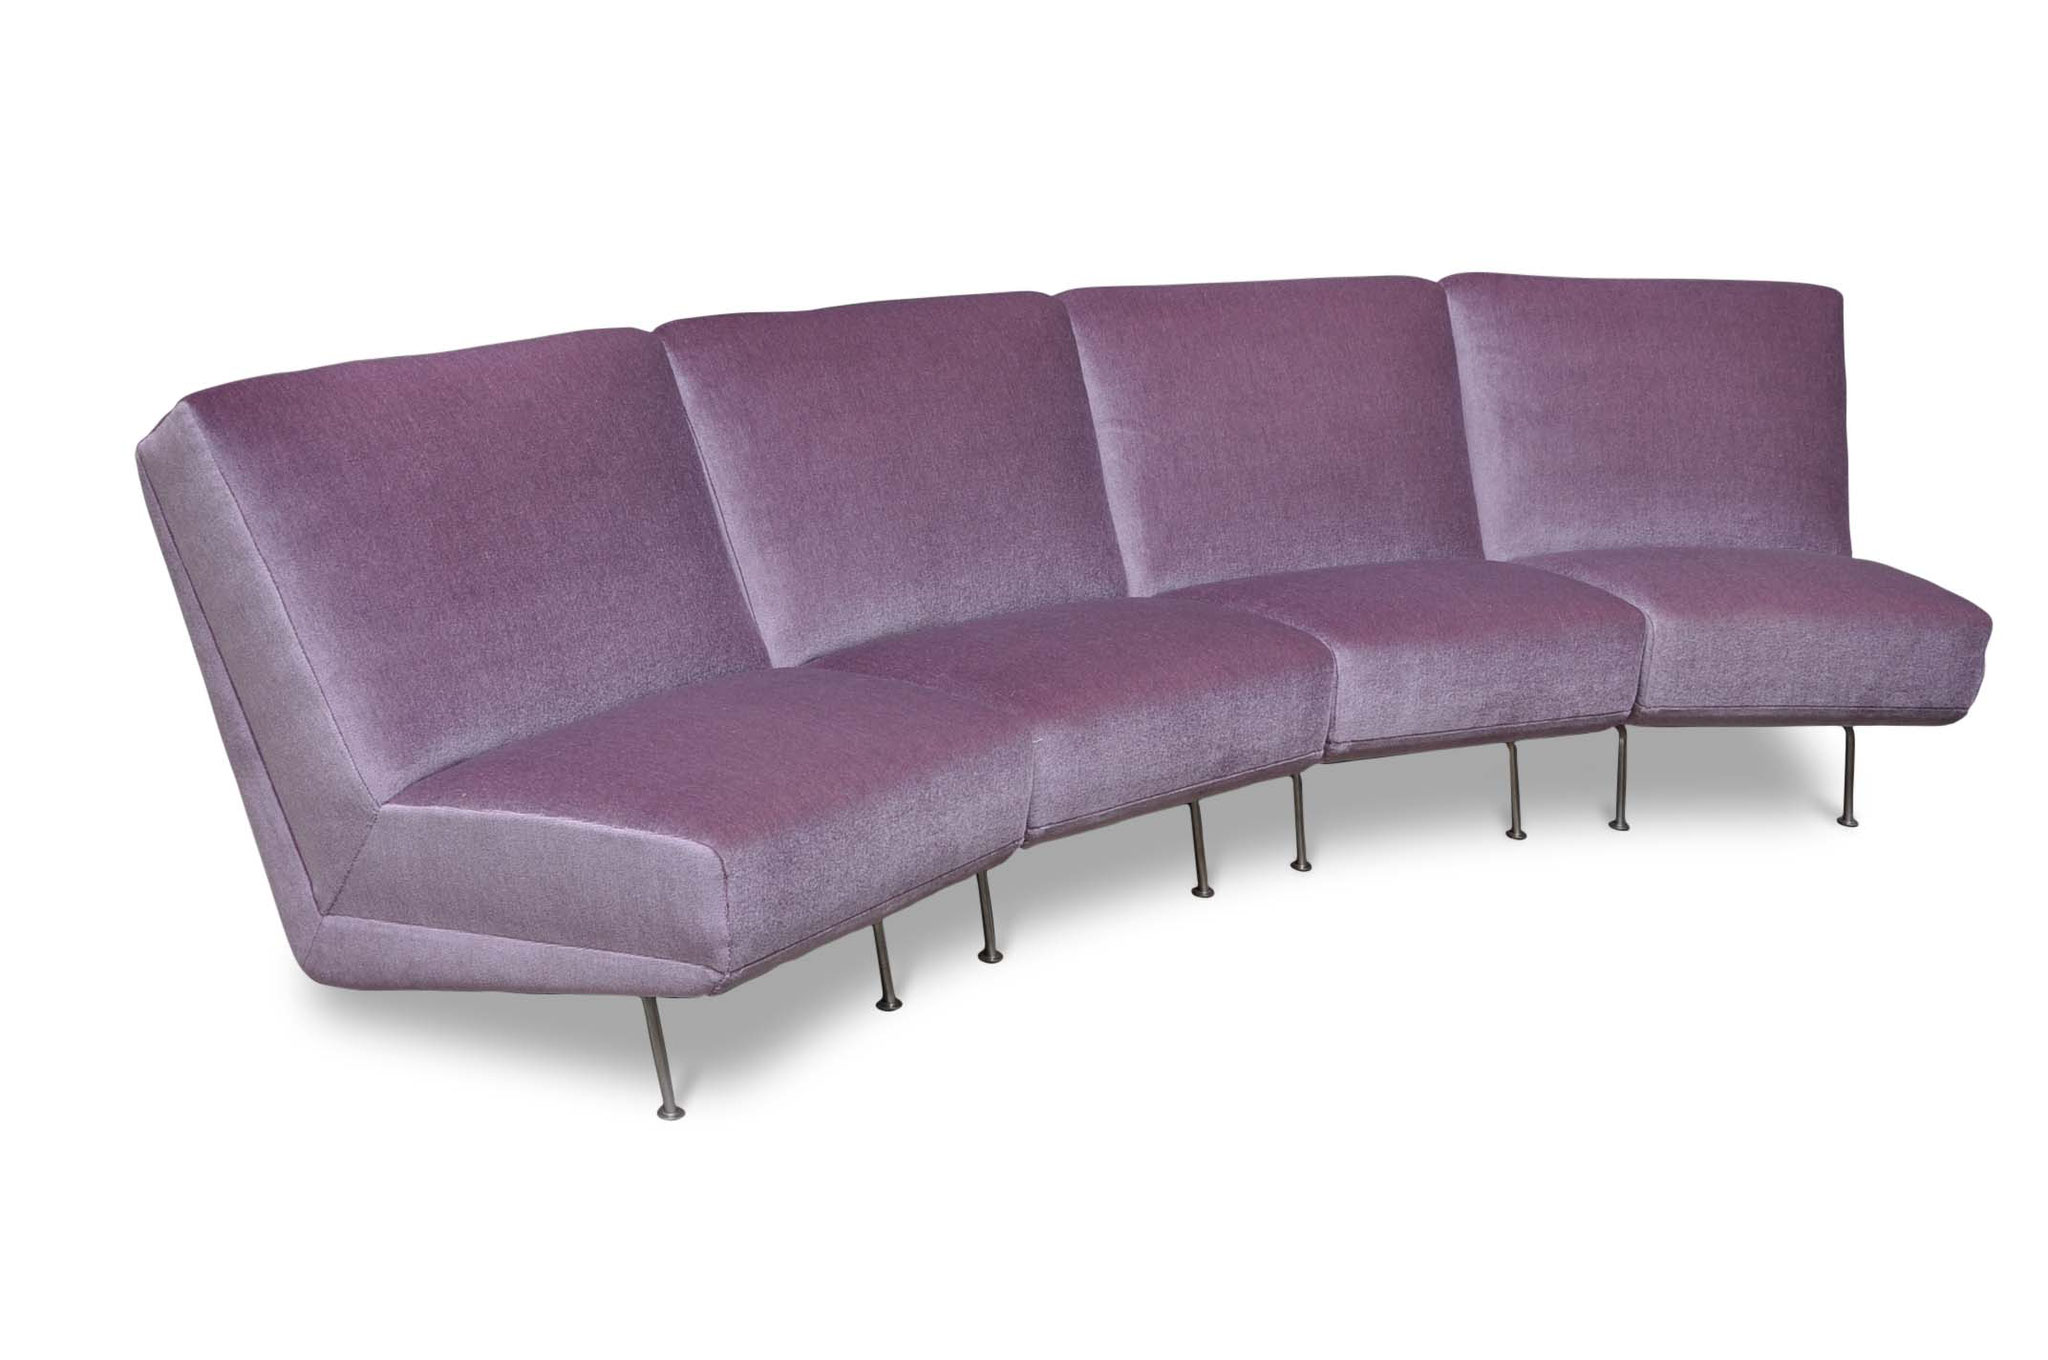 Artifort sofa Theo Ruth mohair